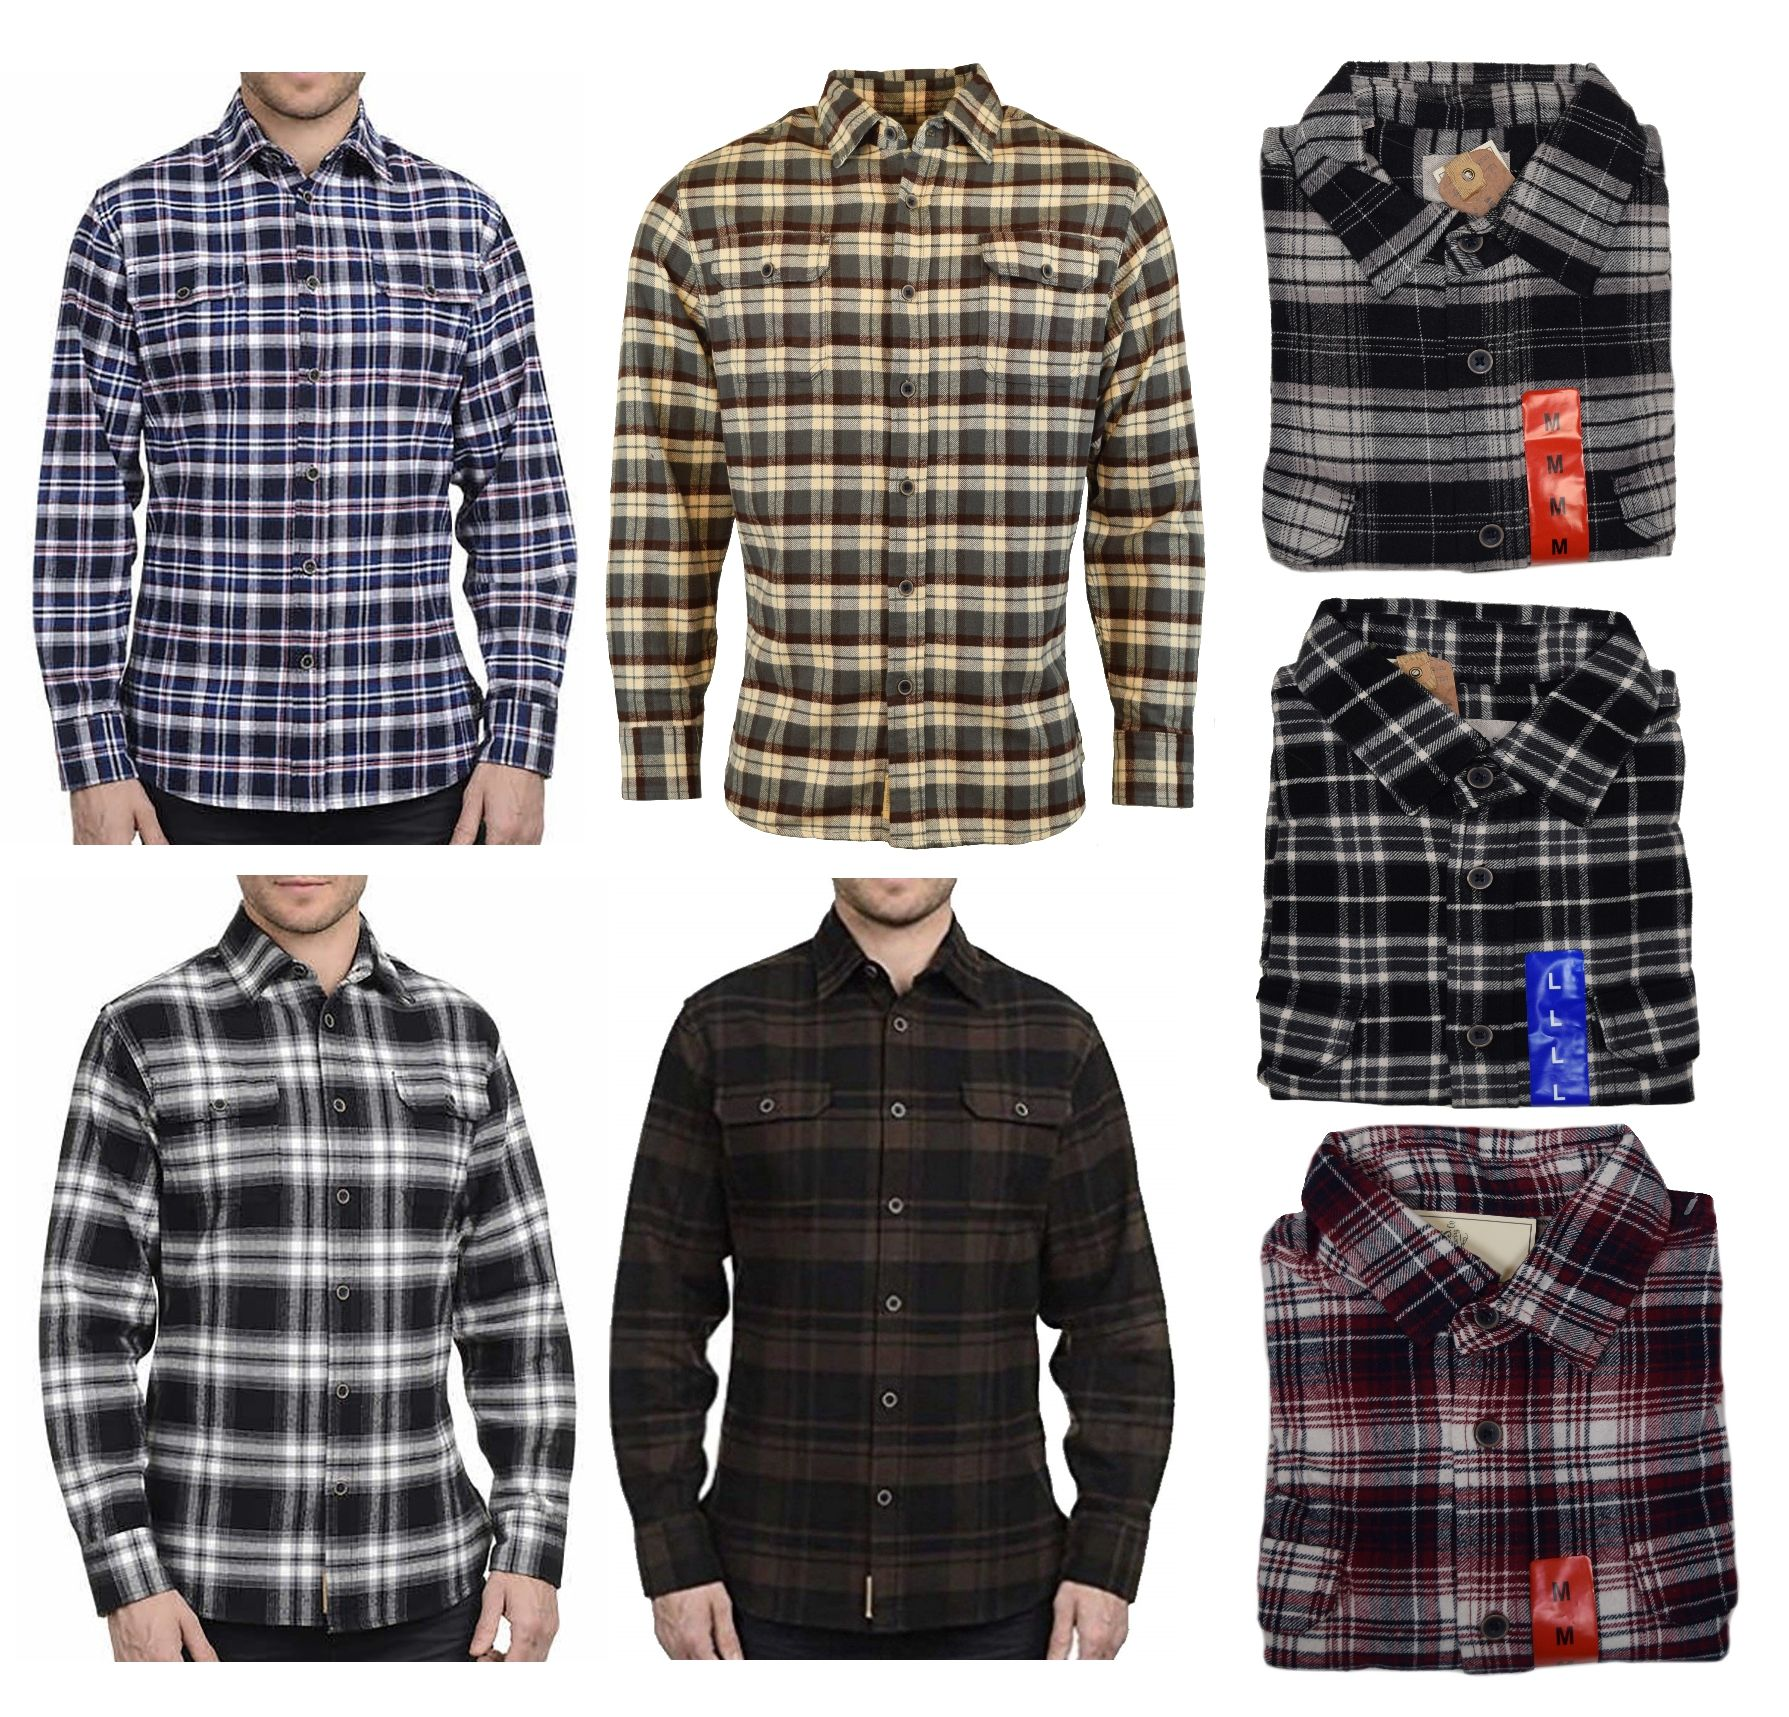 Jachs Men's Brawny Long Sleeve Cotton Flannel Shirt